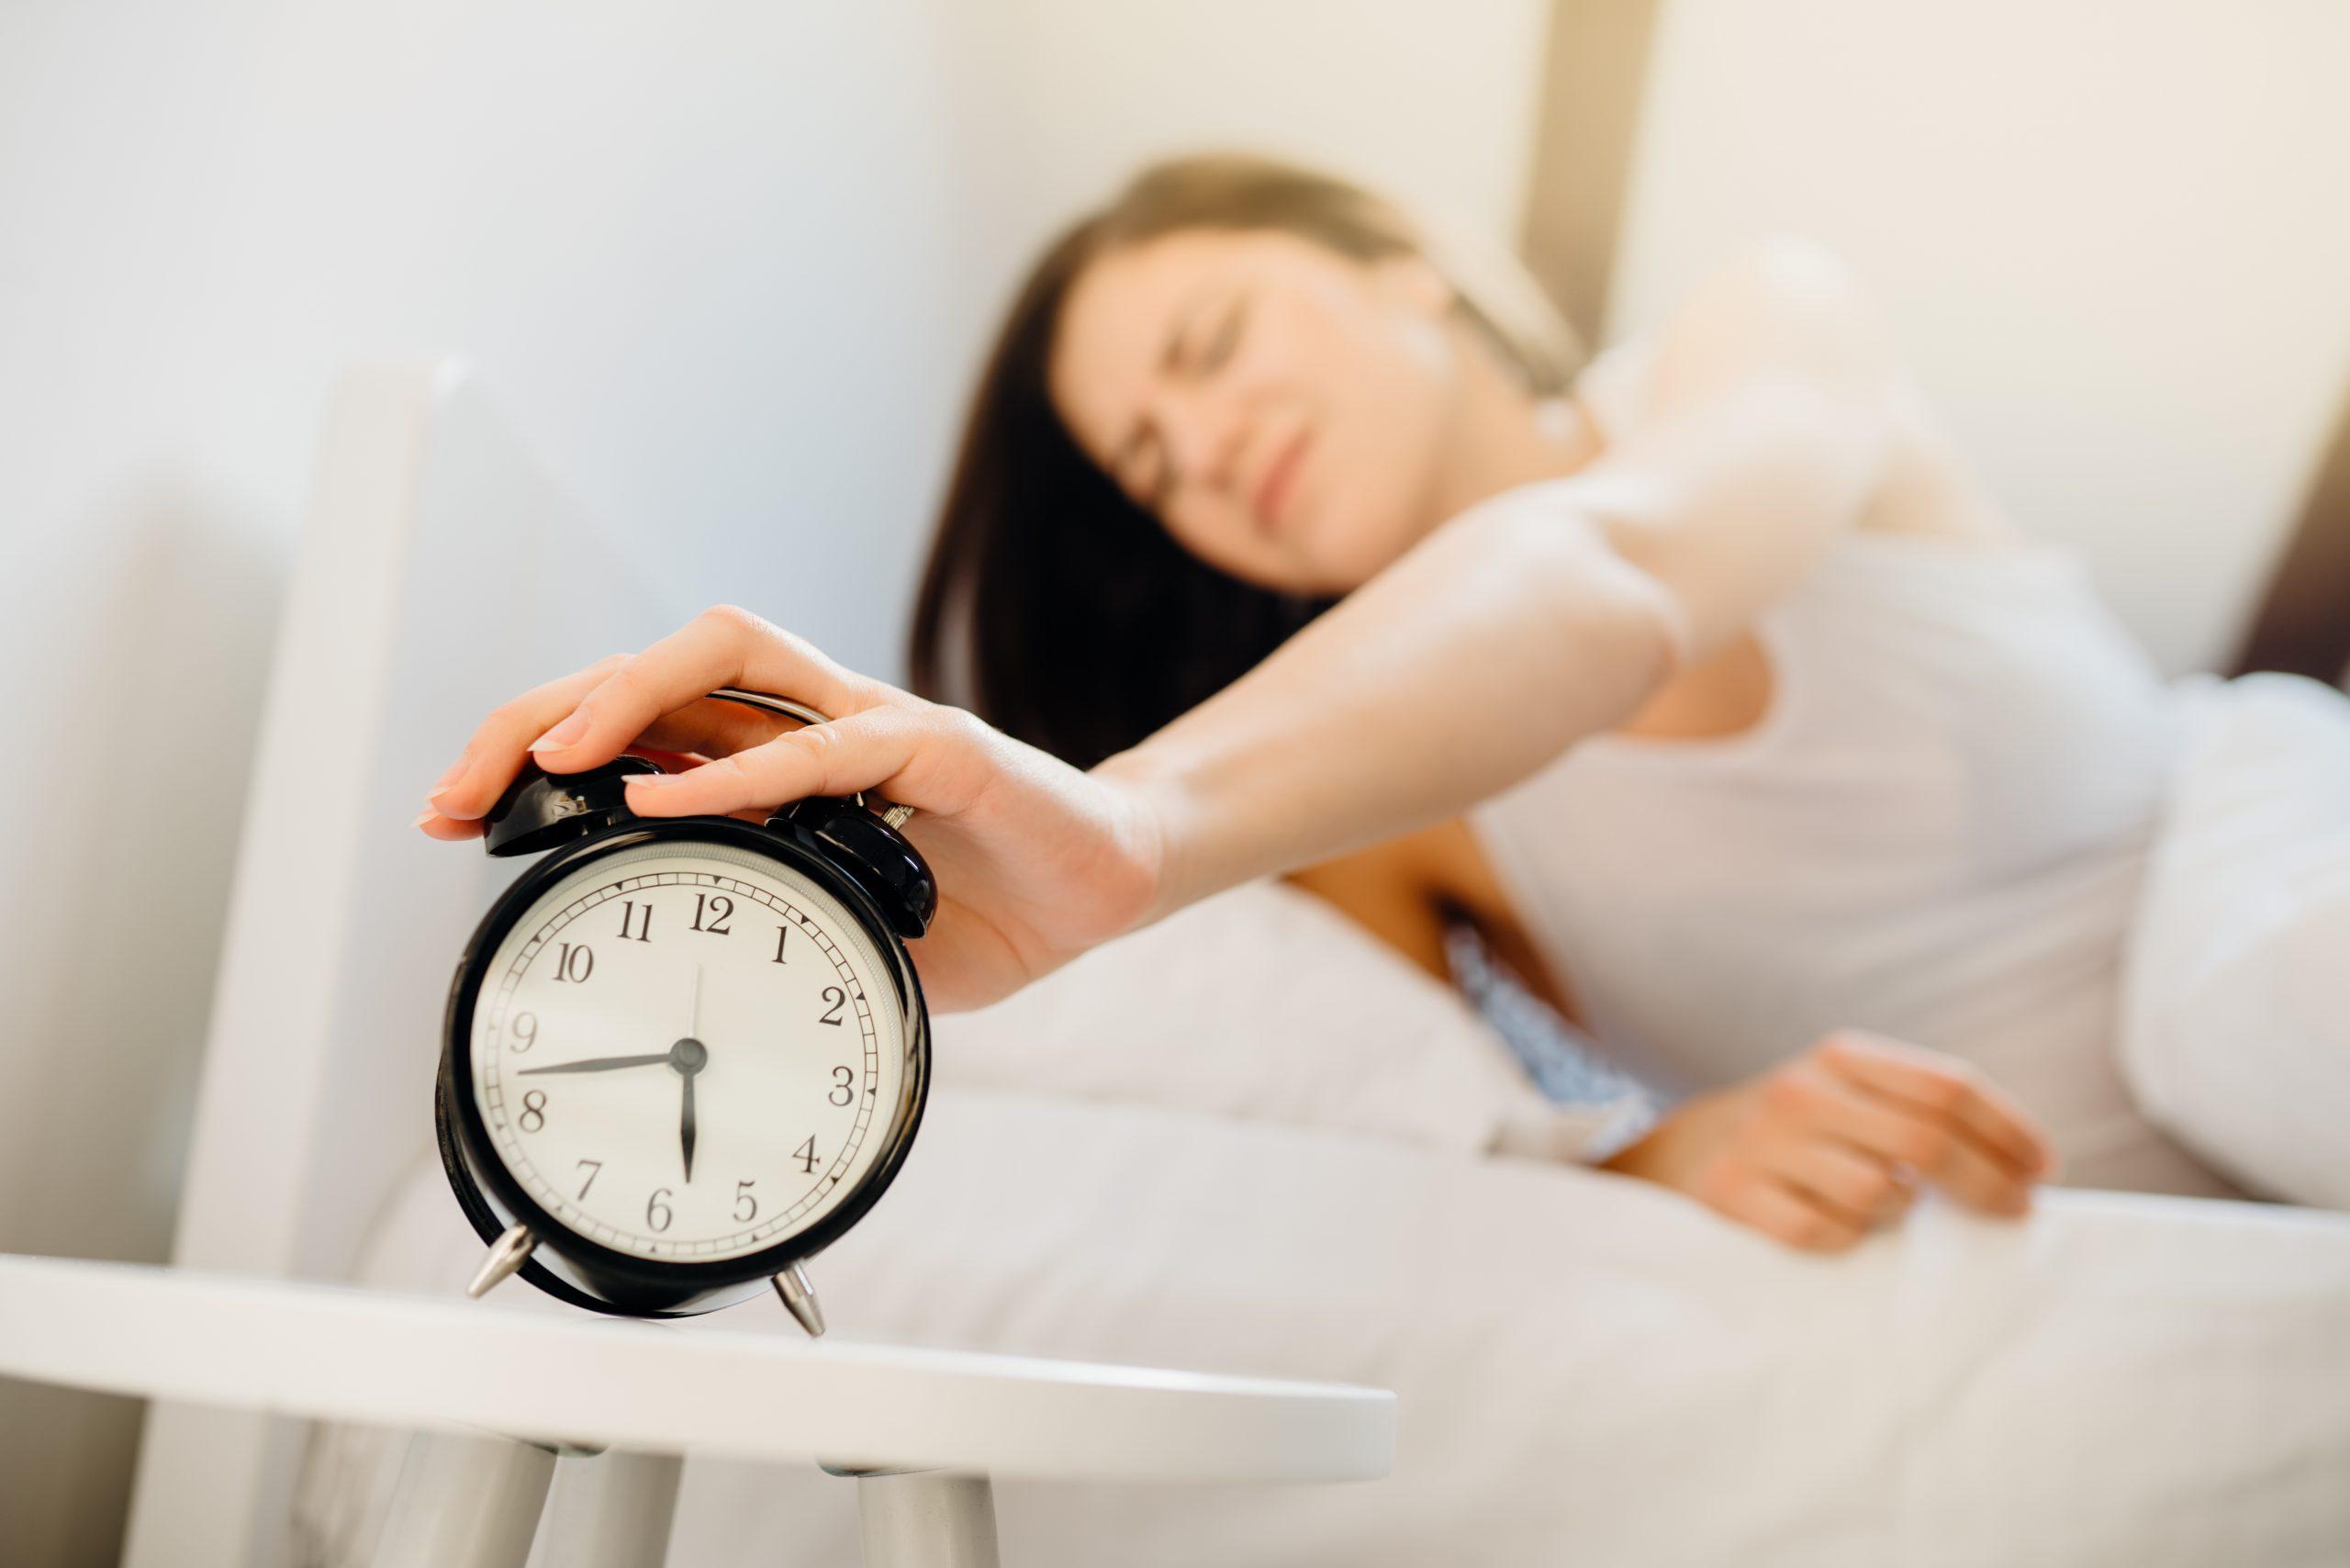 Alarm clock ringing.Woman waking up in early morning for work.Sleeping disorder.Tired woman oversleeping,bad sleep quality.Sleep deprived mom.Waking inertia,bad mood after dreaming nightmares.Insomnia